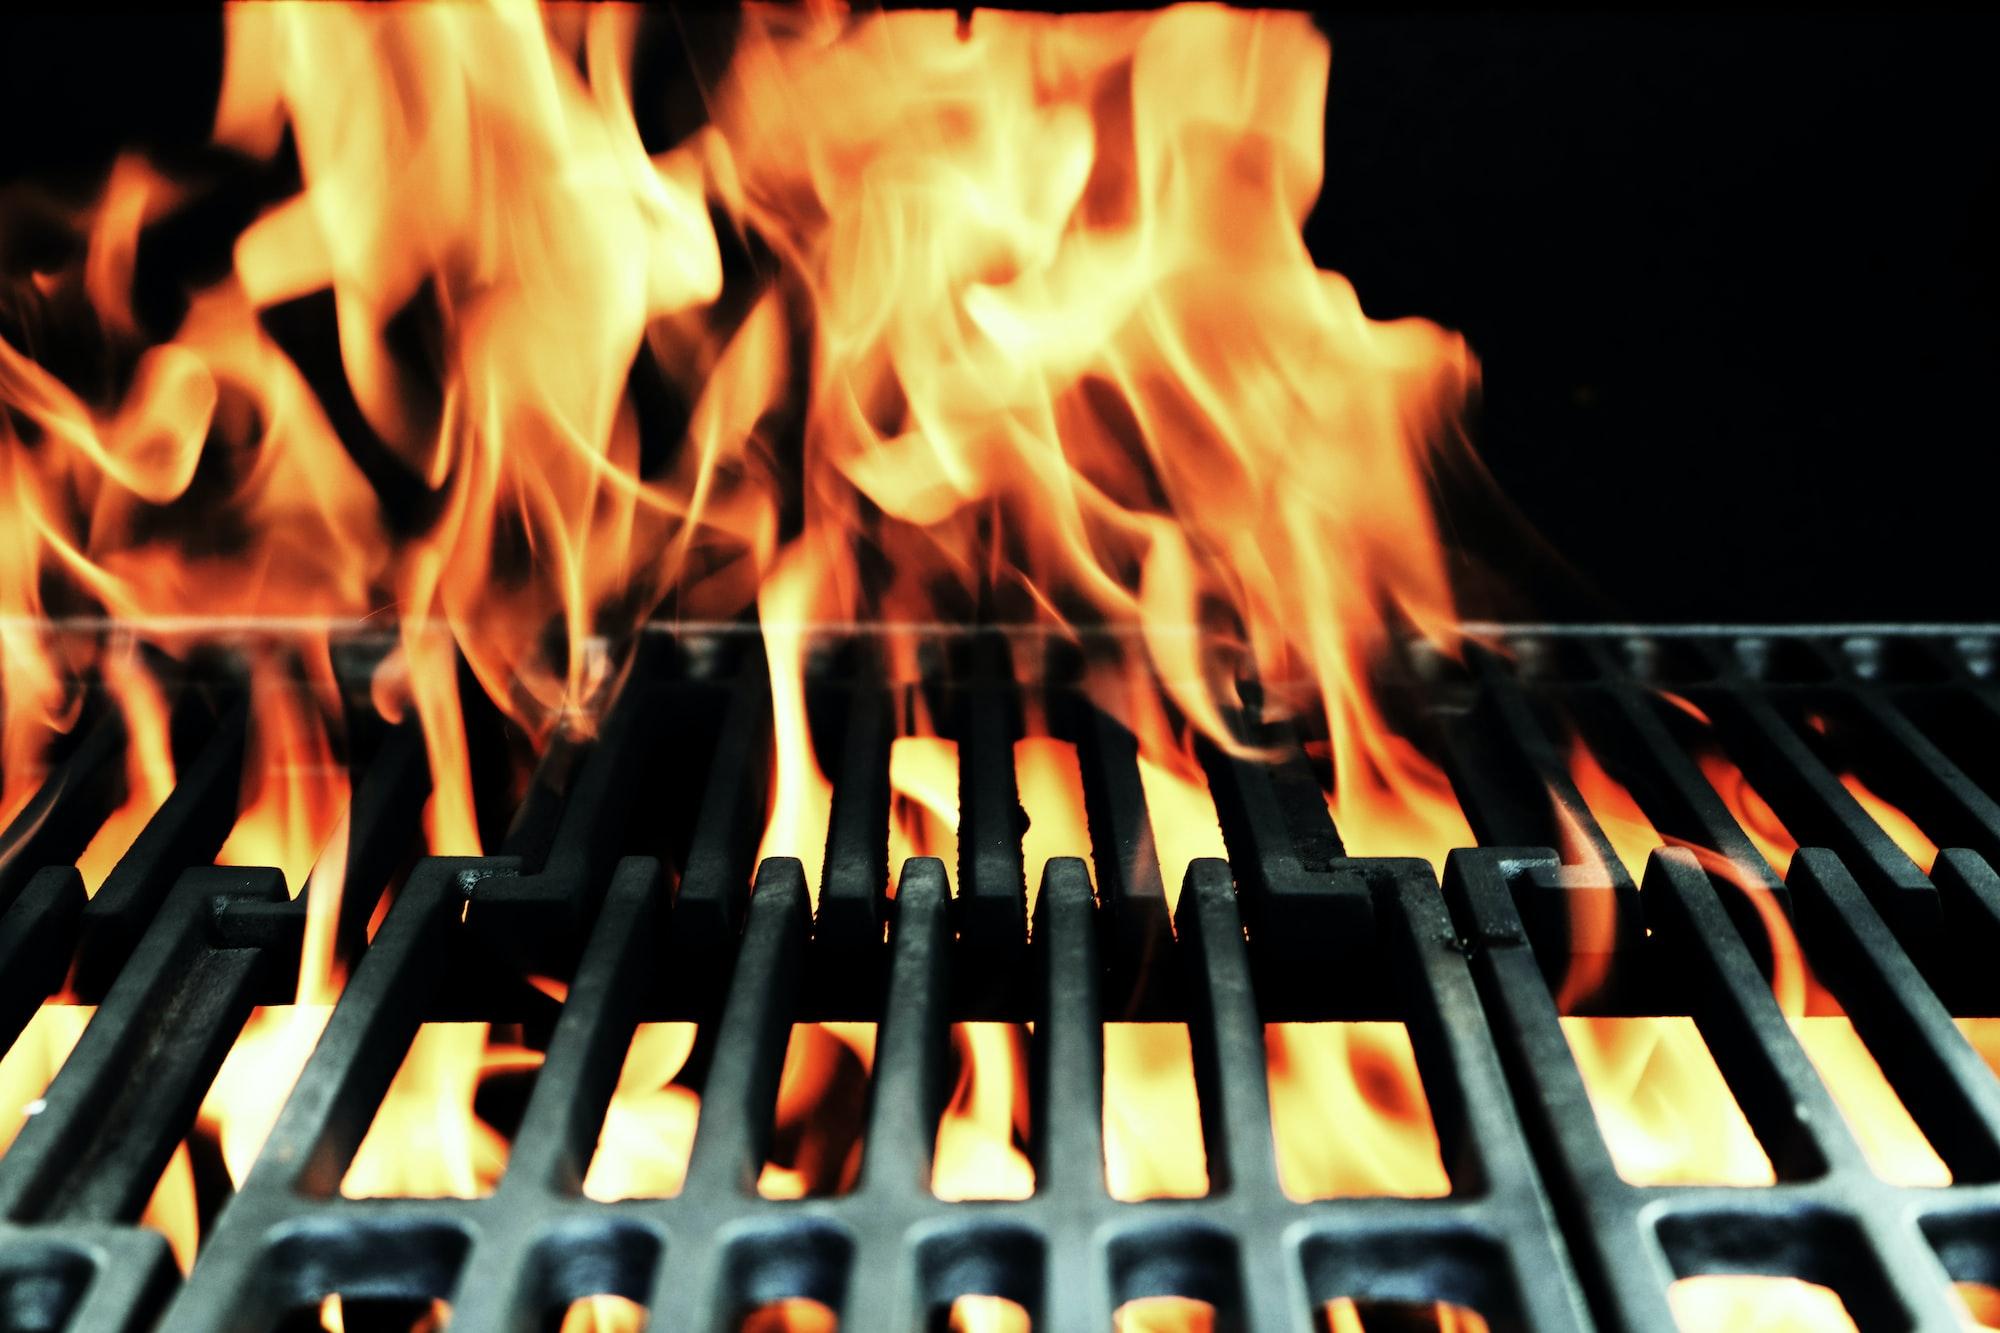 Fresh off the TechBBQ grill